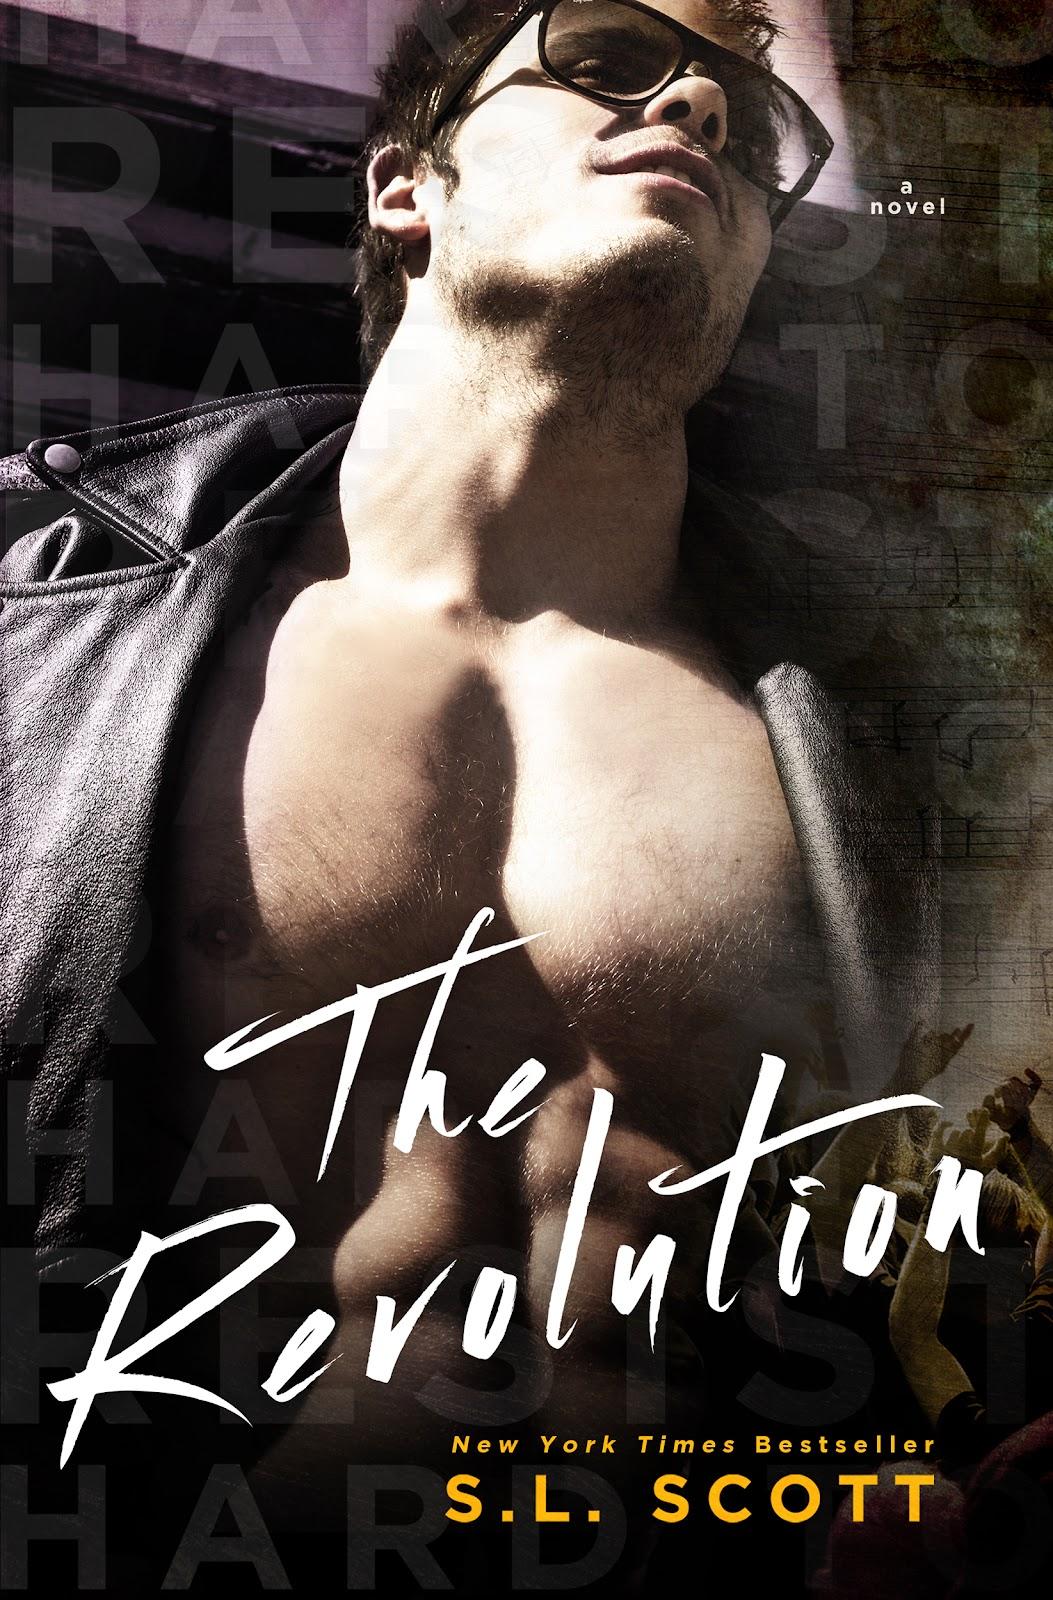 The Revolution Ebook Cover 1.jpg